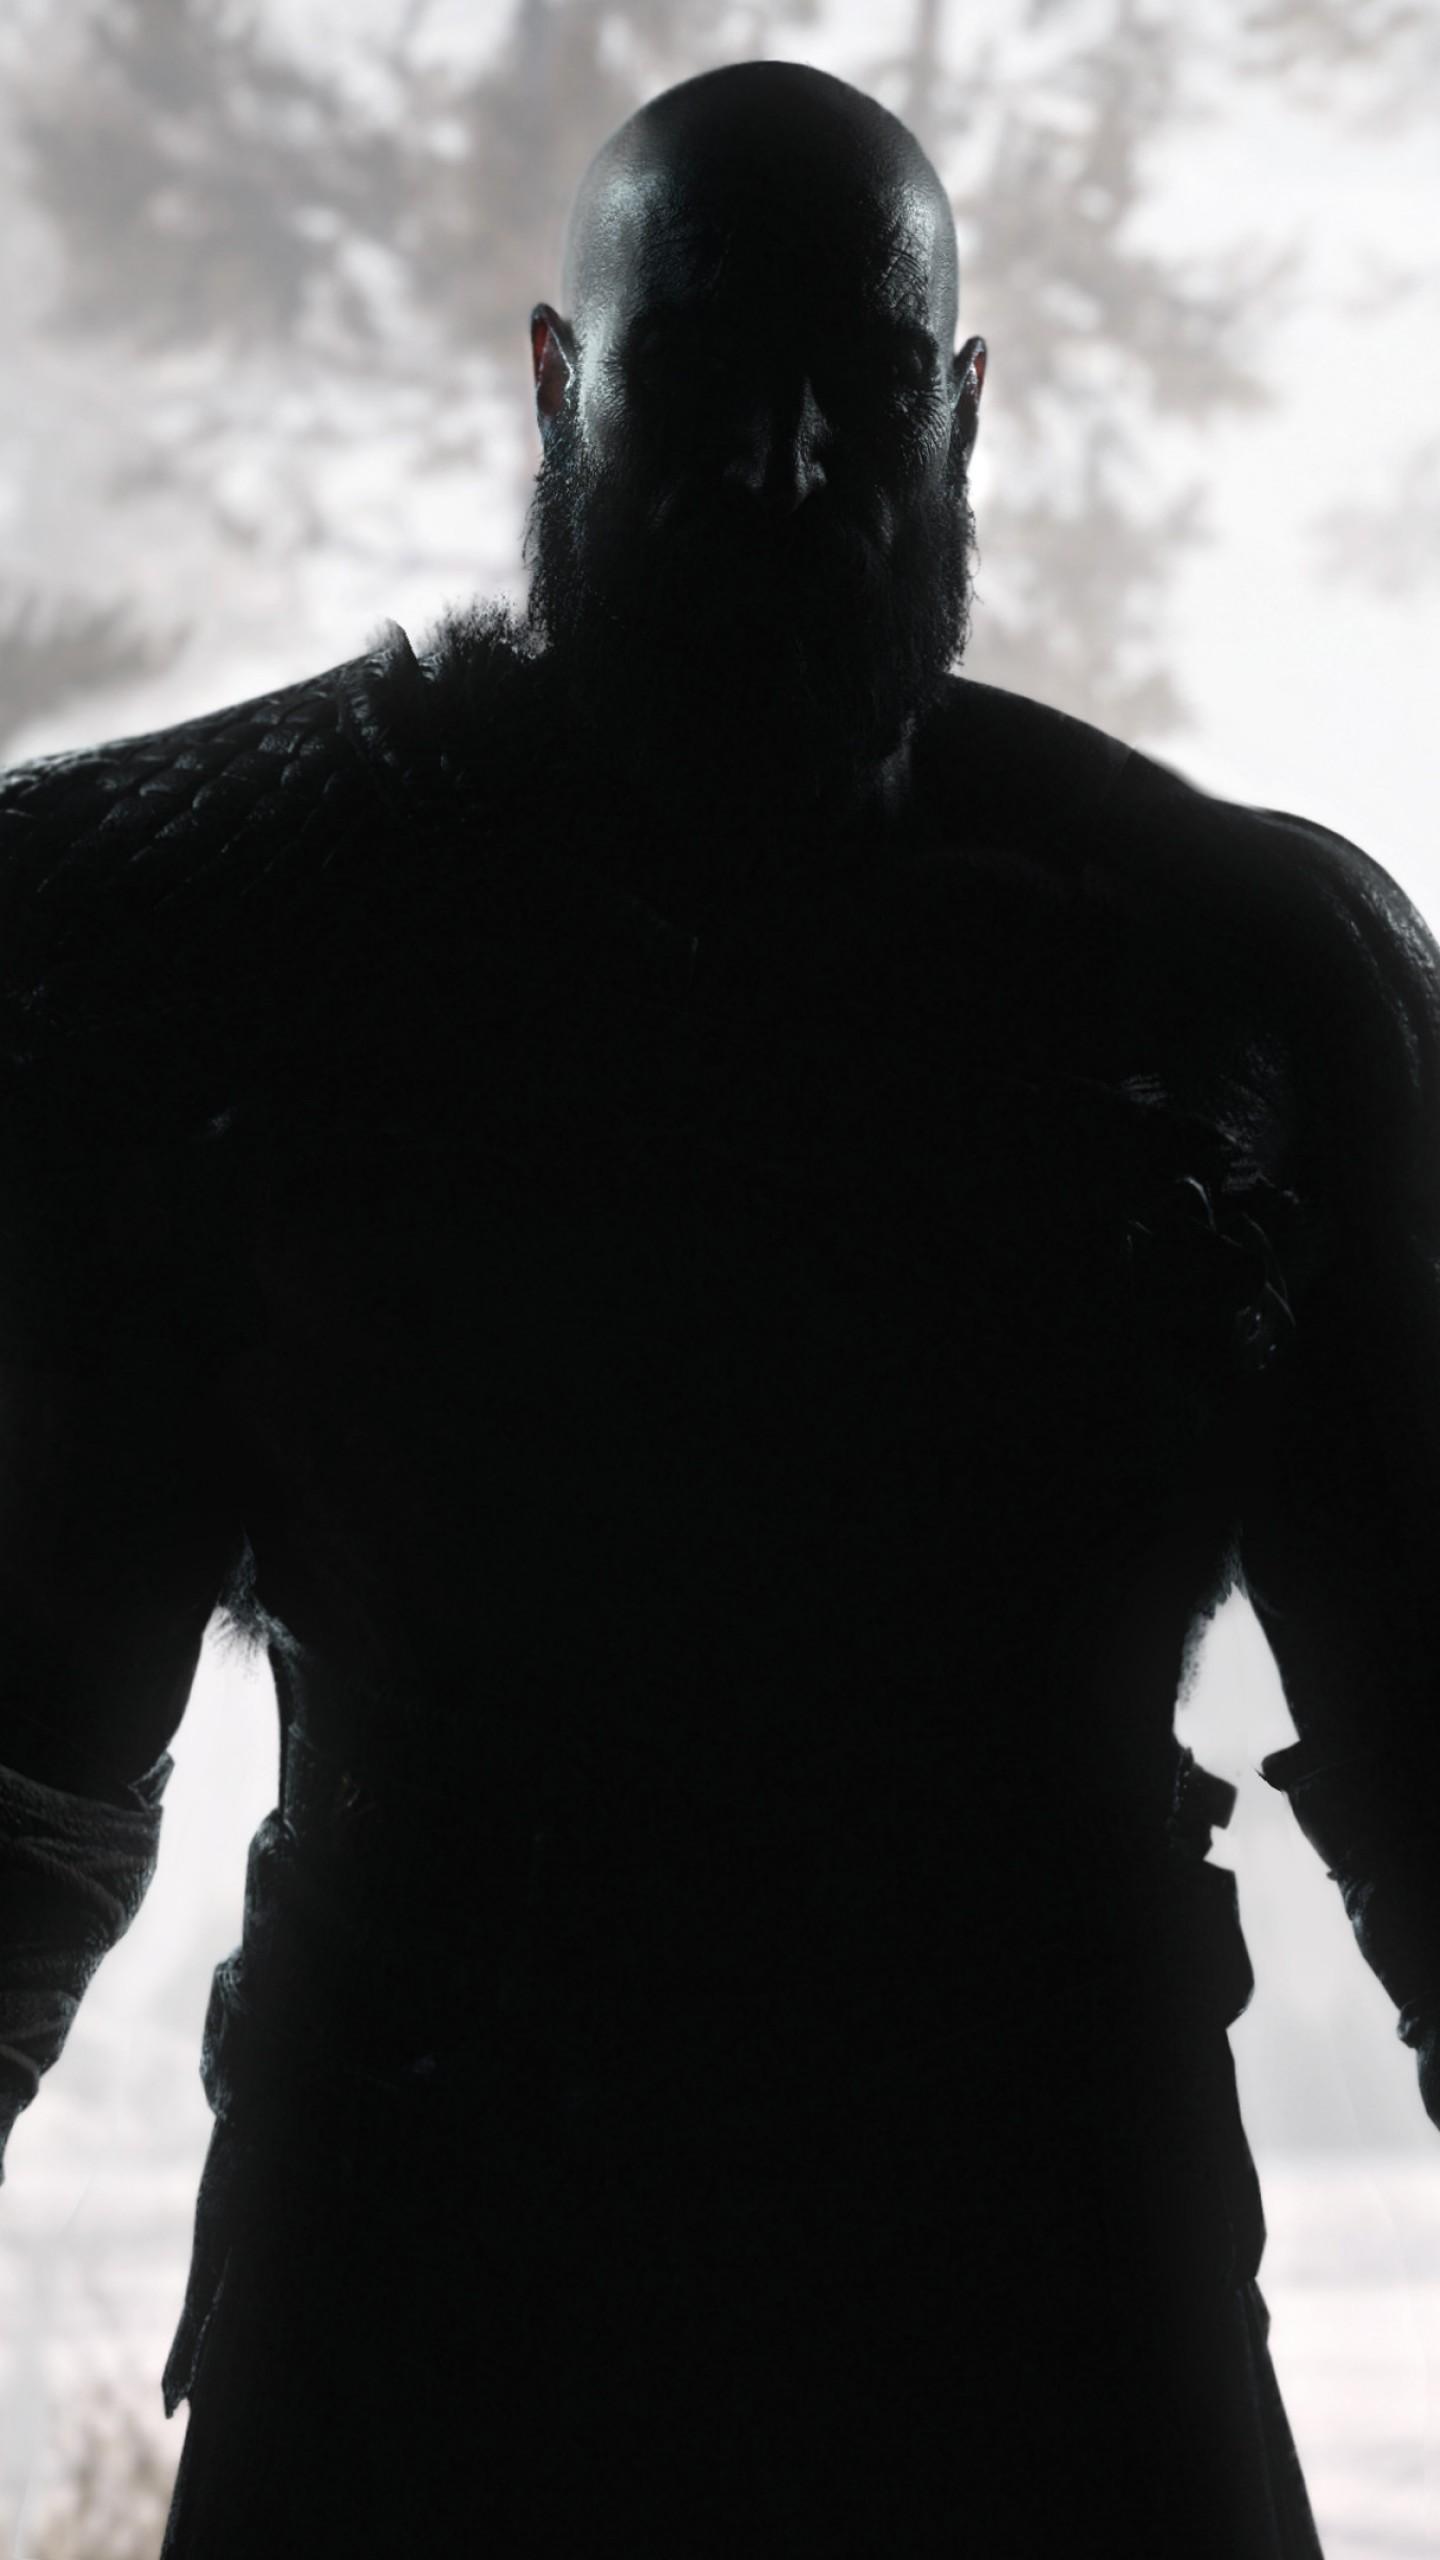 God Of War 2018 Wallpaper Mobile - HD Wallpaper